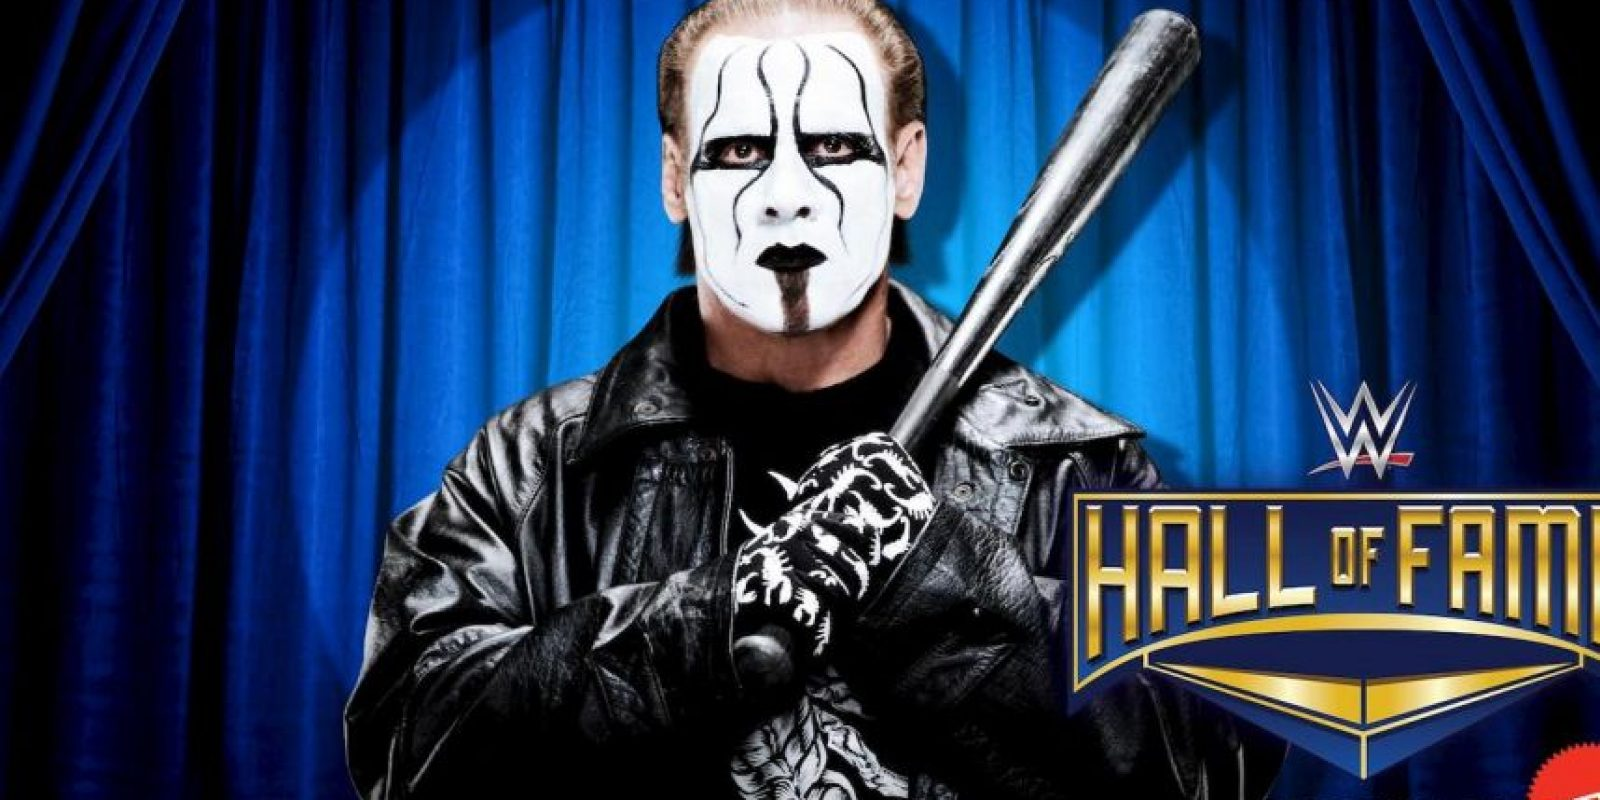 La estrella de la WWE hizo oficial su retiro durante la ceremonia de la Investidura del Salón de la Fama 2016. Foto:WWE. Imagen Por: